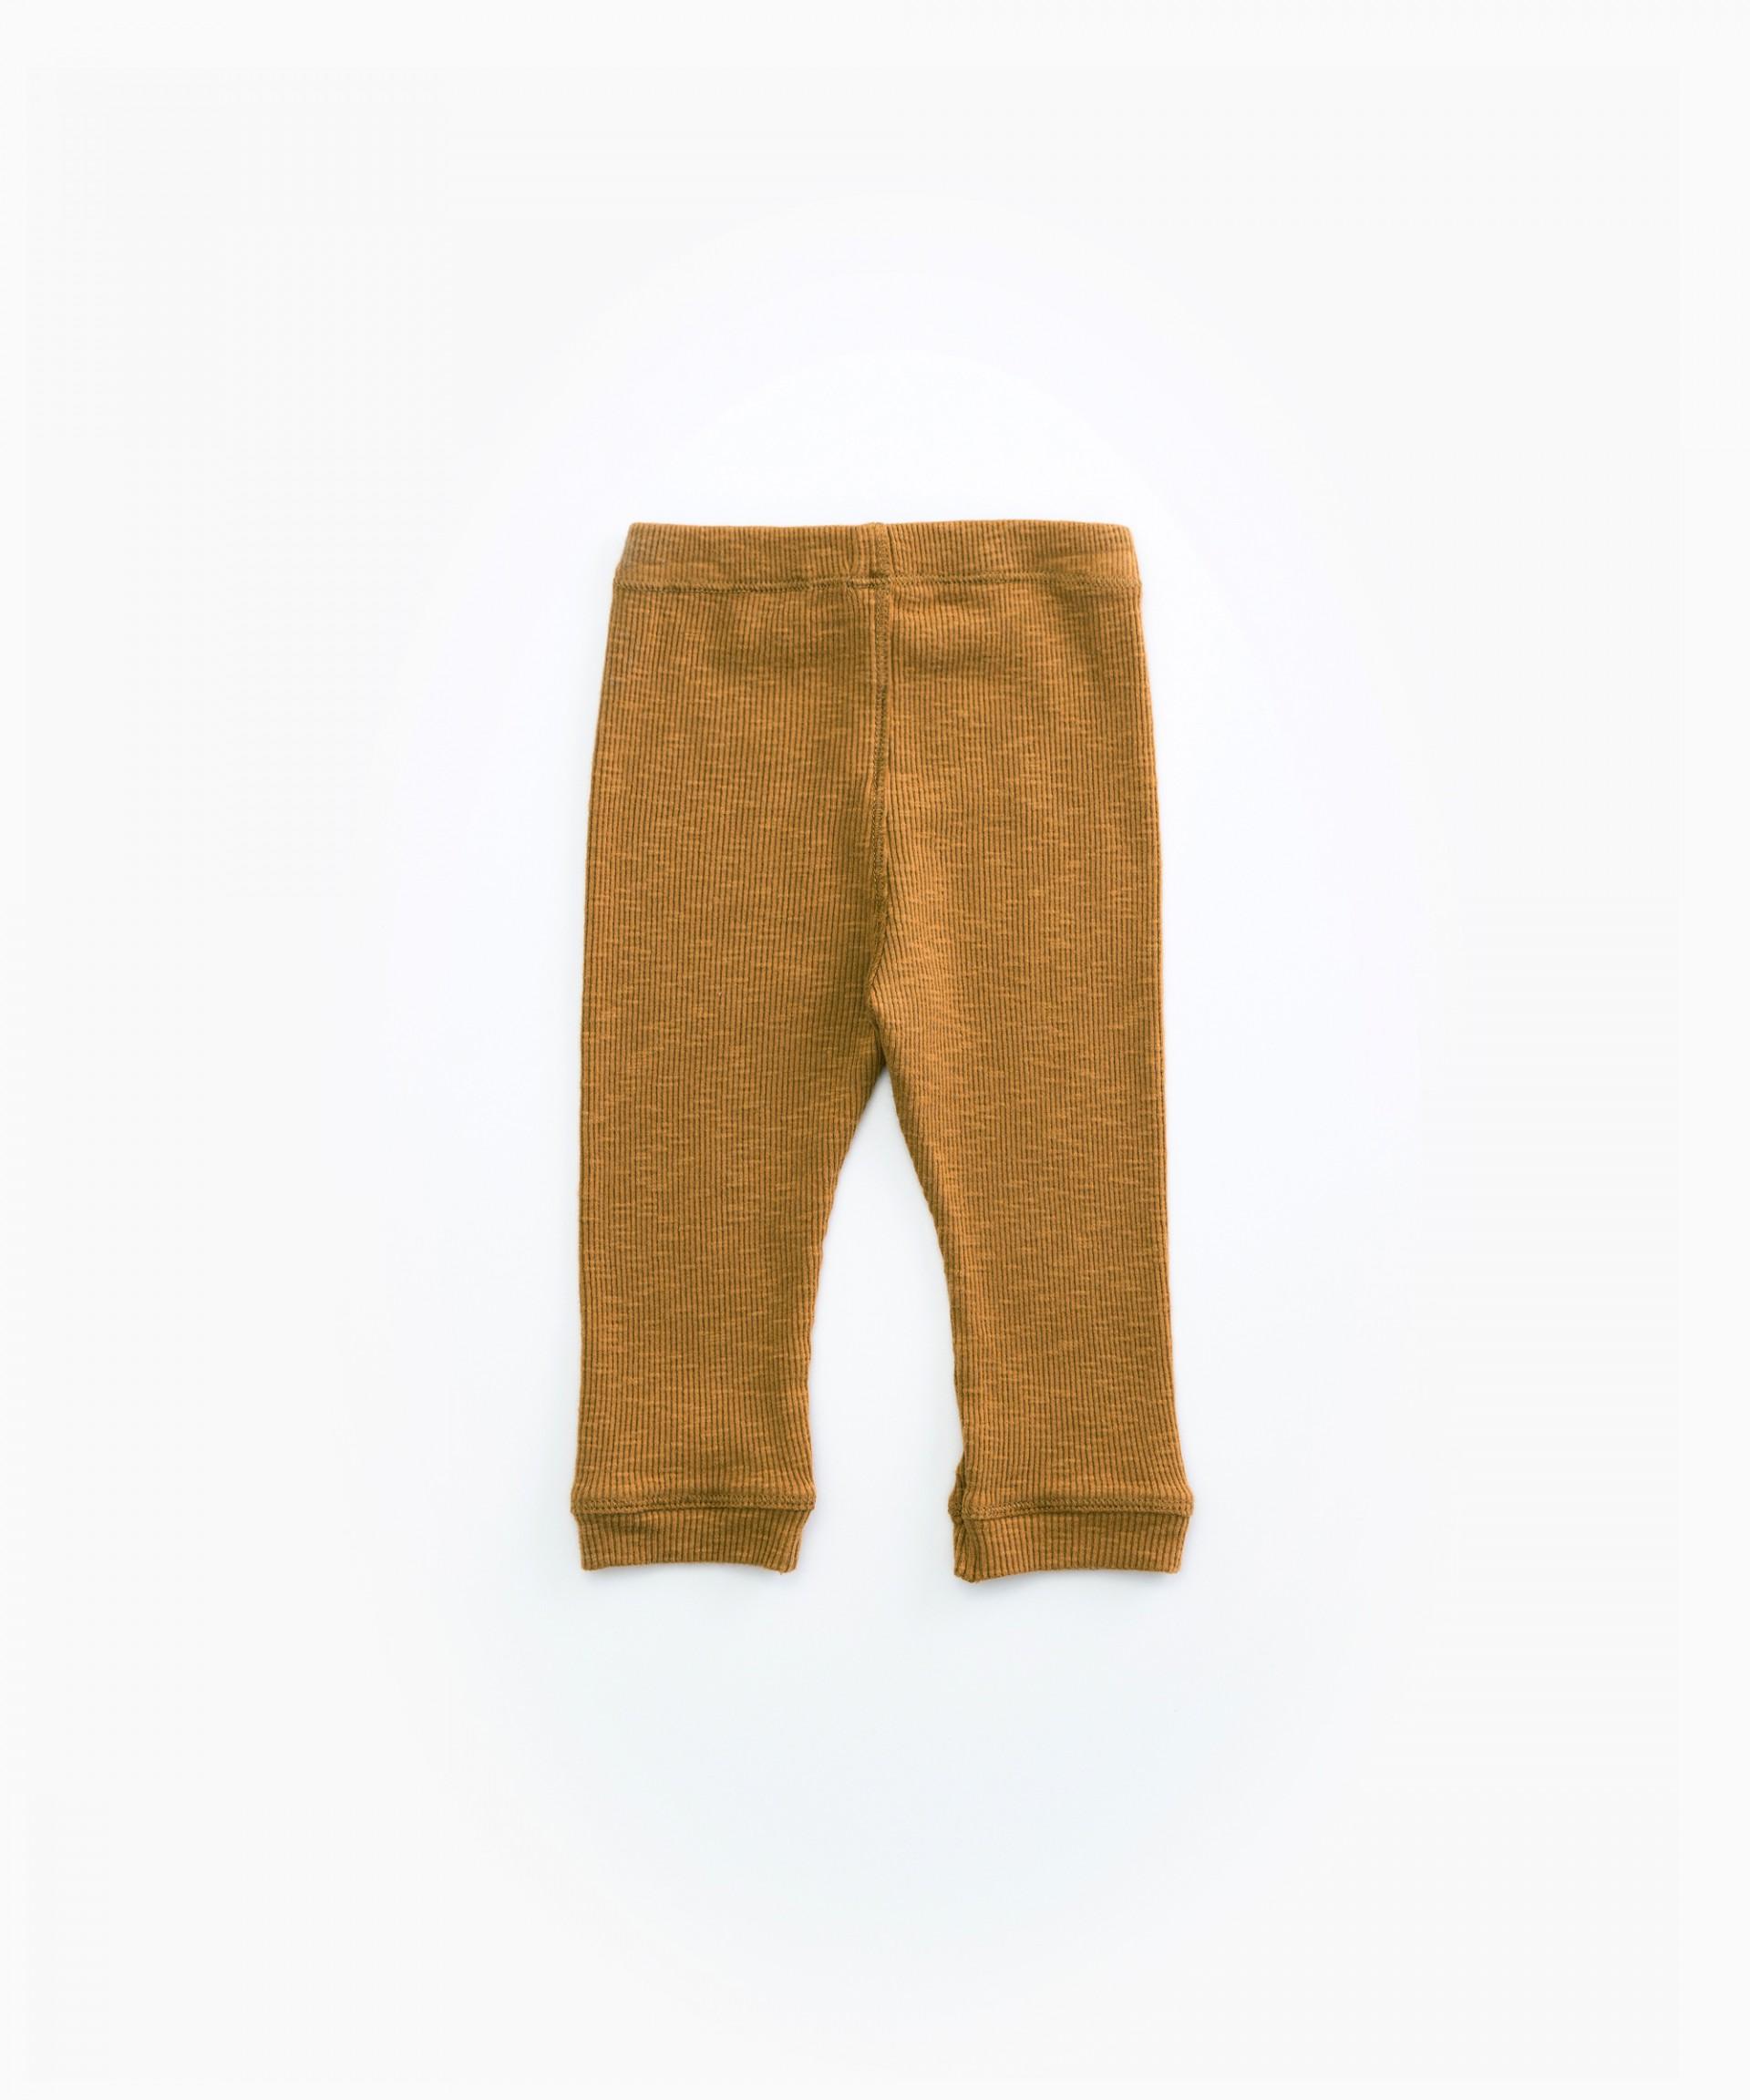 Leggings in organic cotton | Woodwork